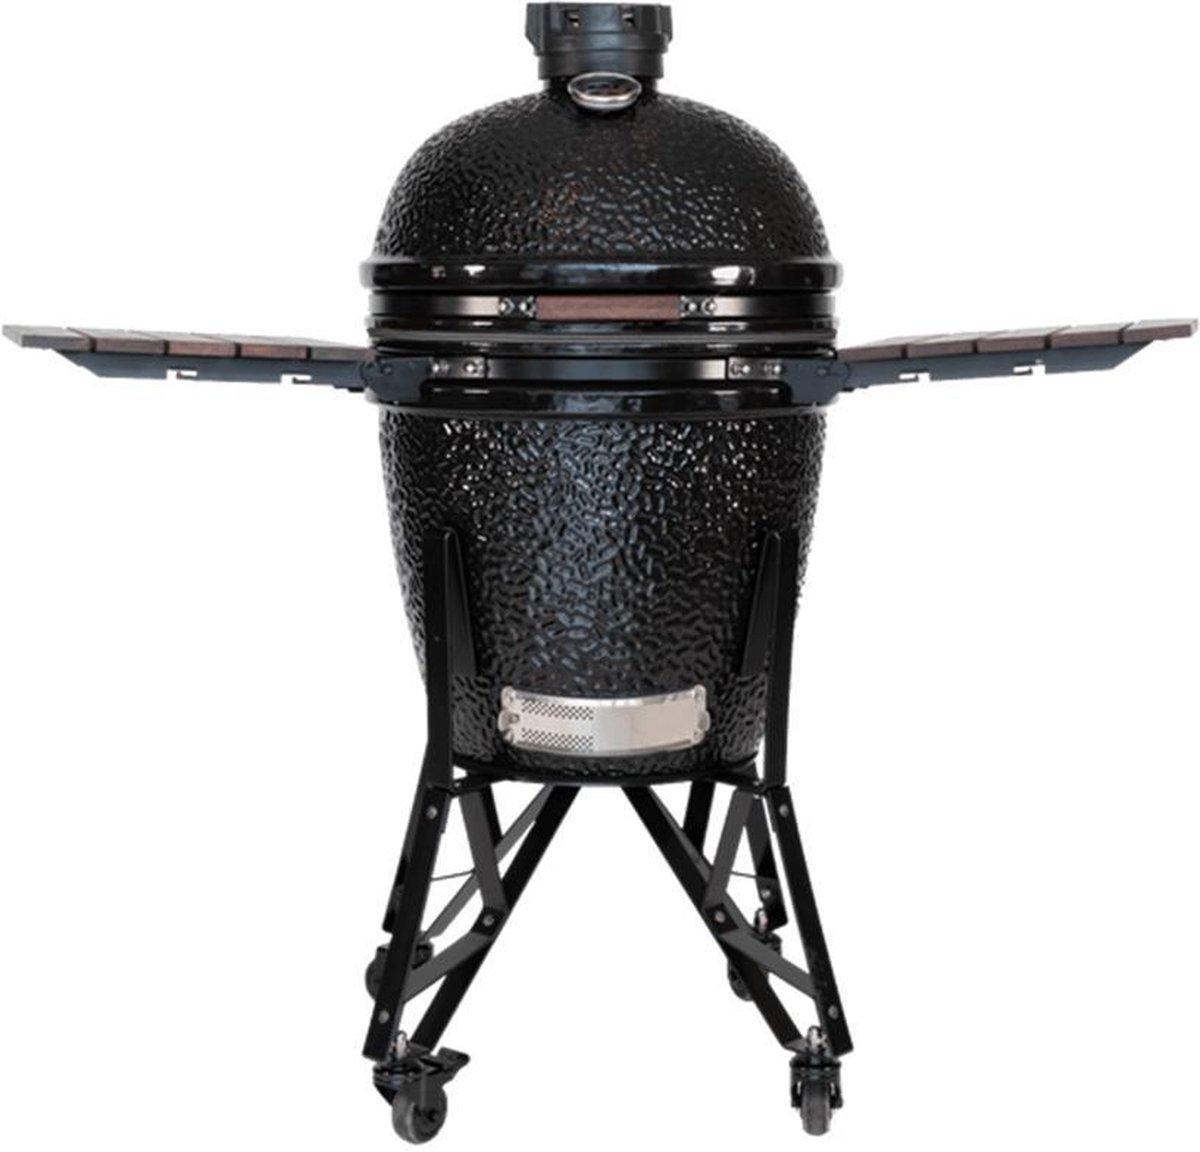 The Bastard Large Complete - Kamado BBQ - Model 2021